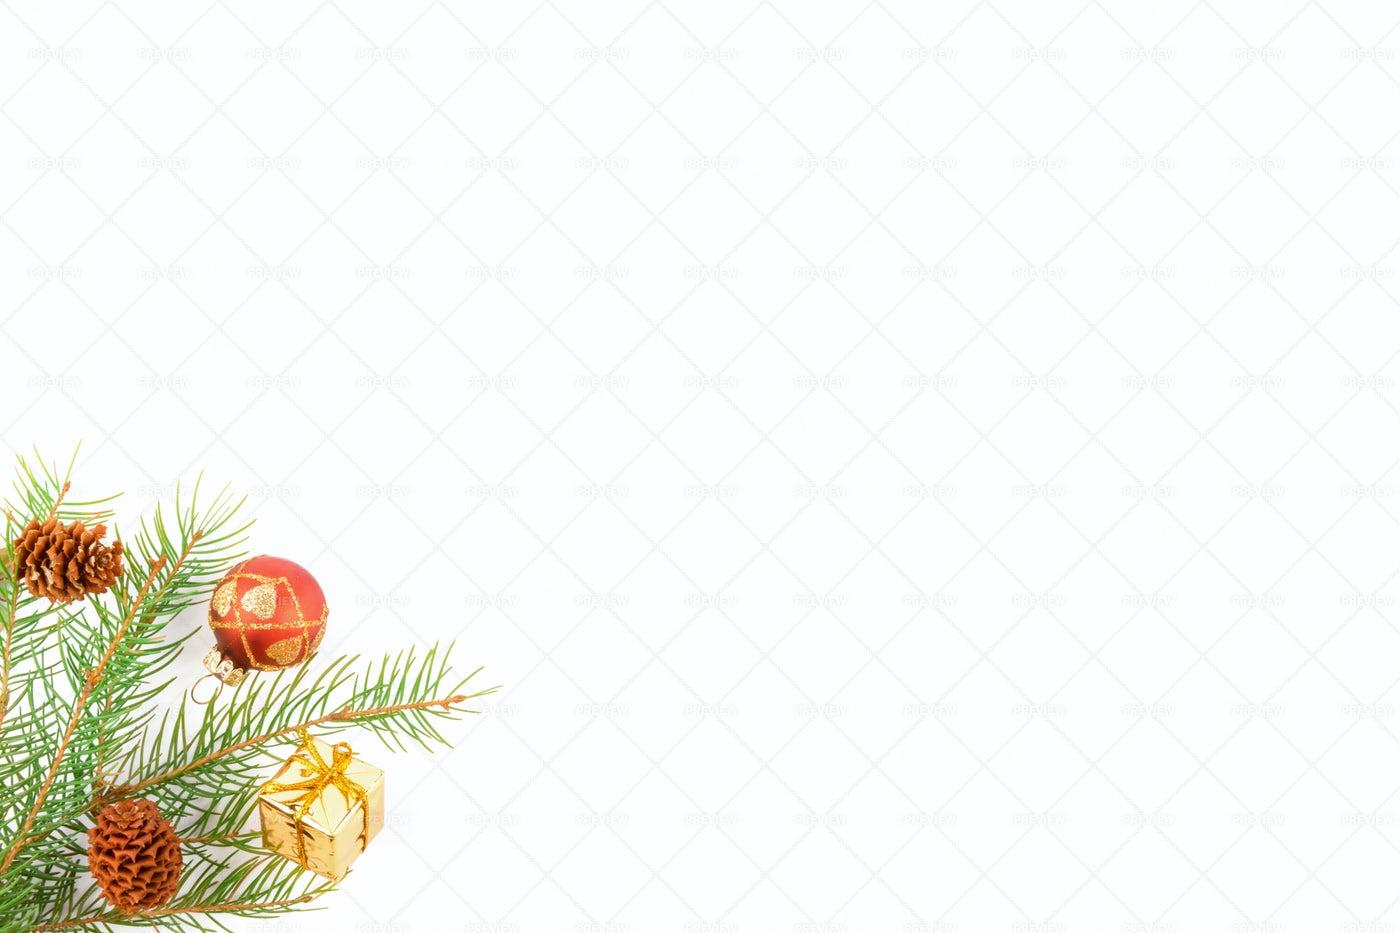 Christmas Fir Background: Stock Photos